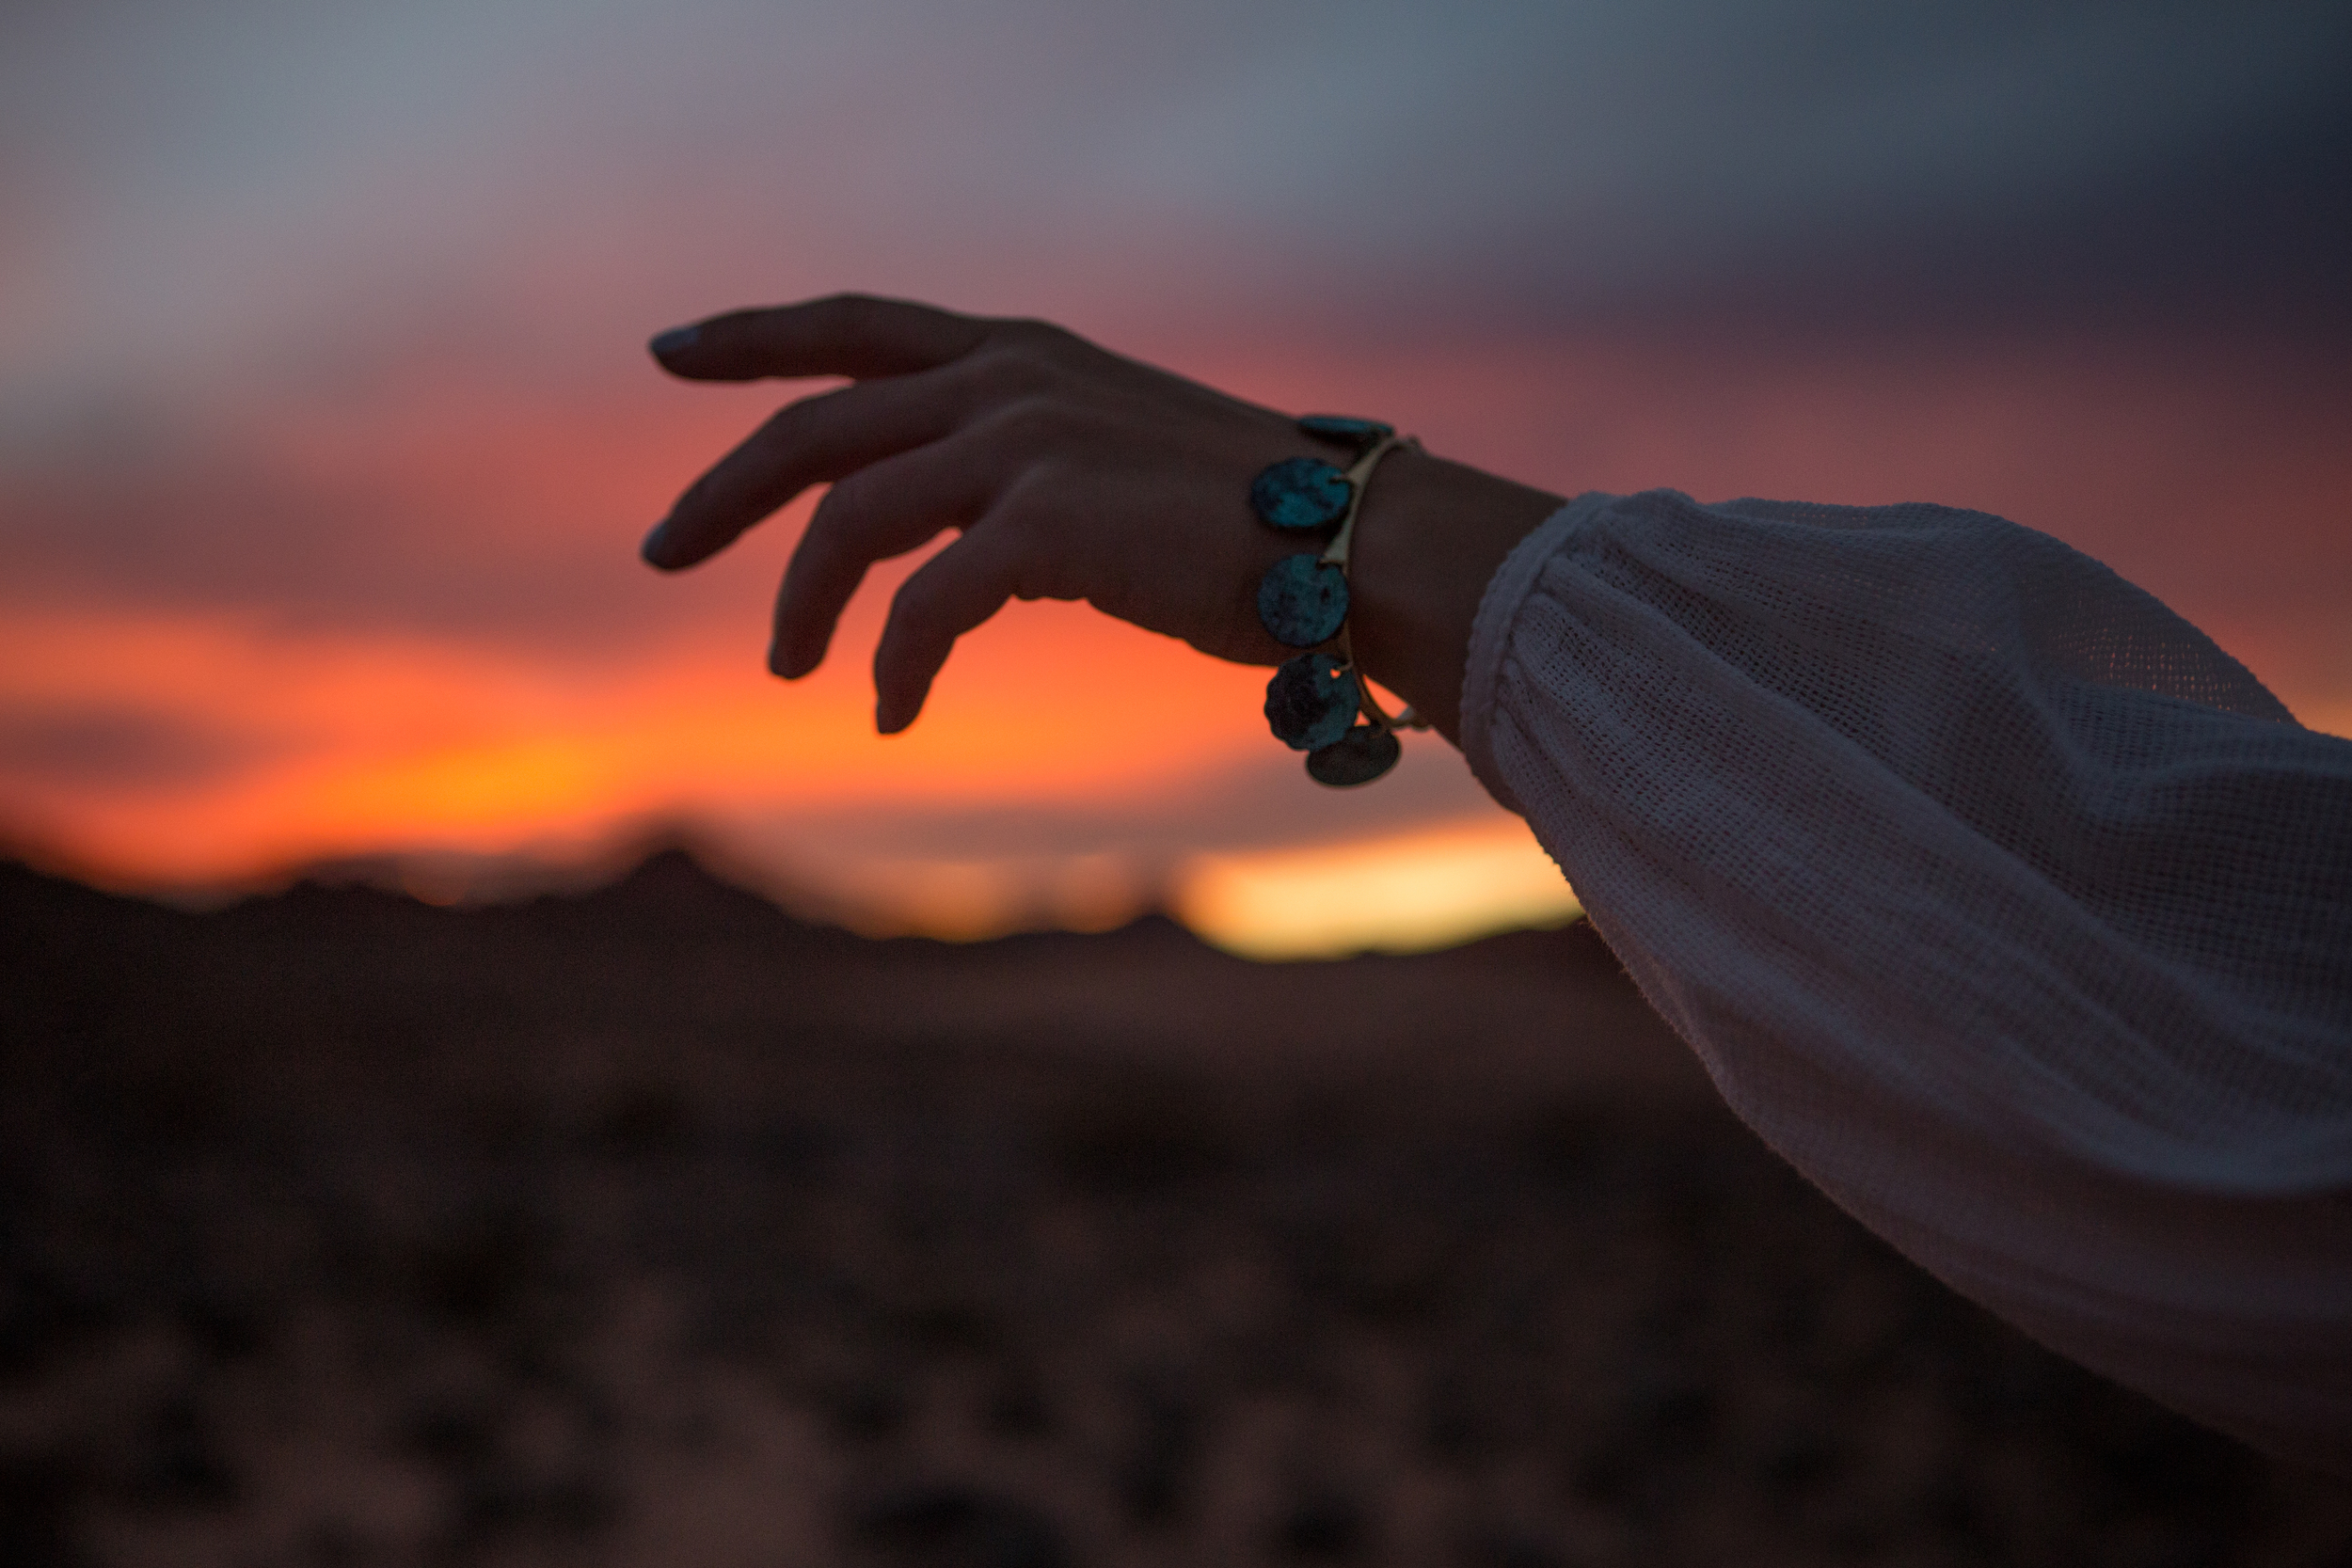 AstroBandit_ValleyOfFire_Sunset_WhiteDress_Dancing_Fashon_11.jpg